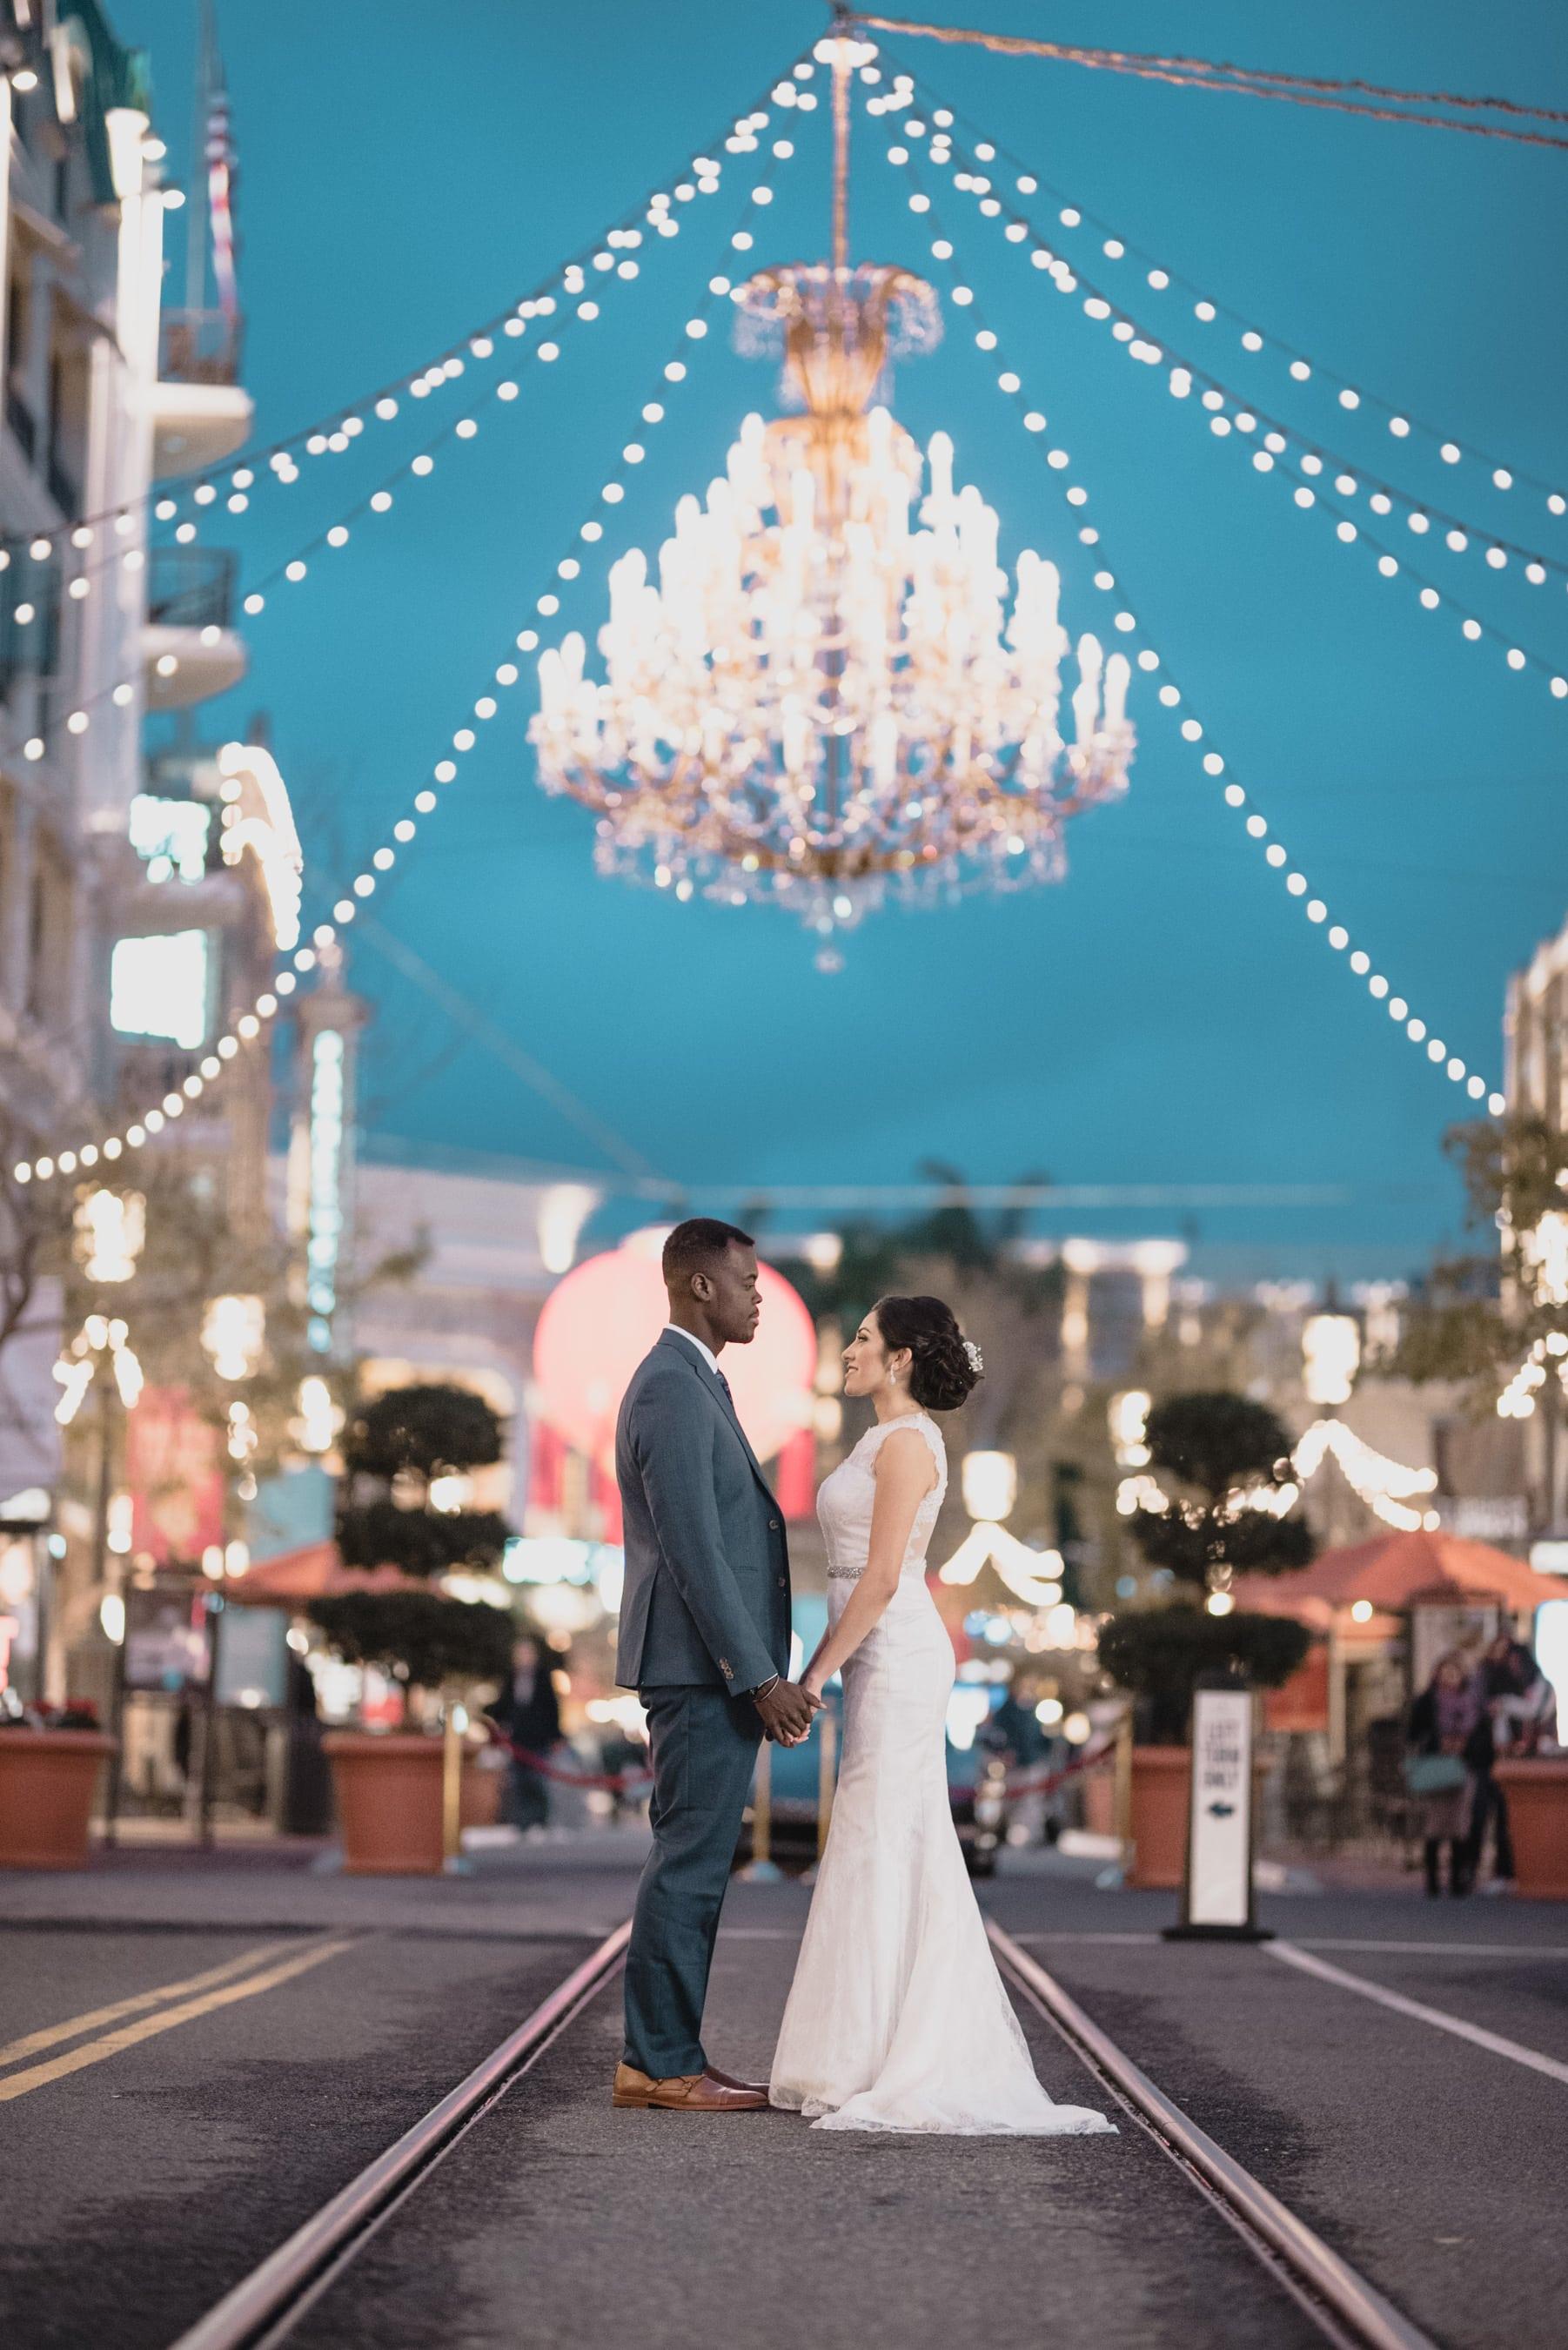 Bride and Groom portrait at Glendale Americana.jpg